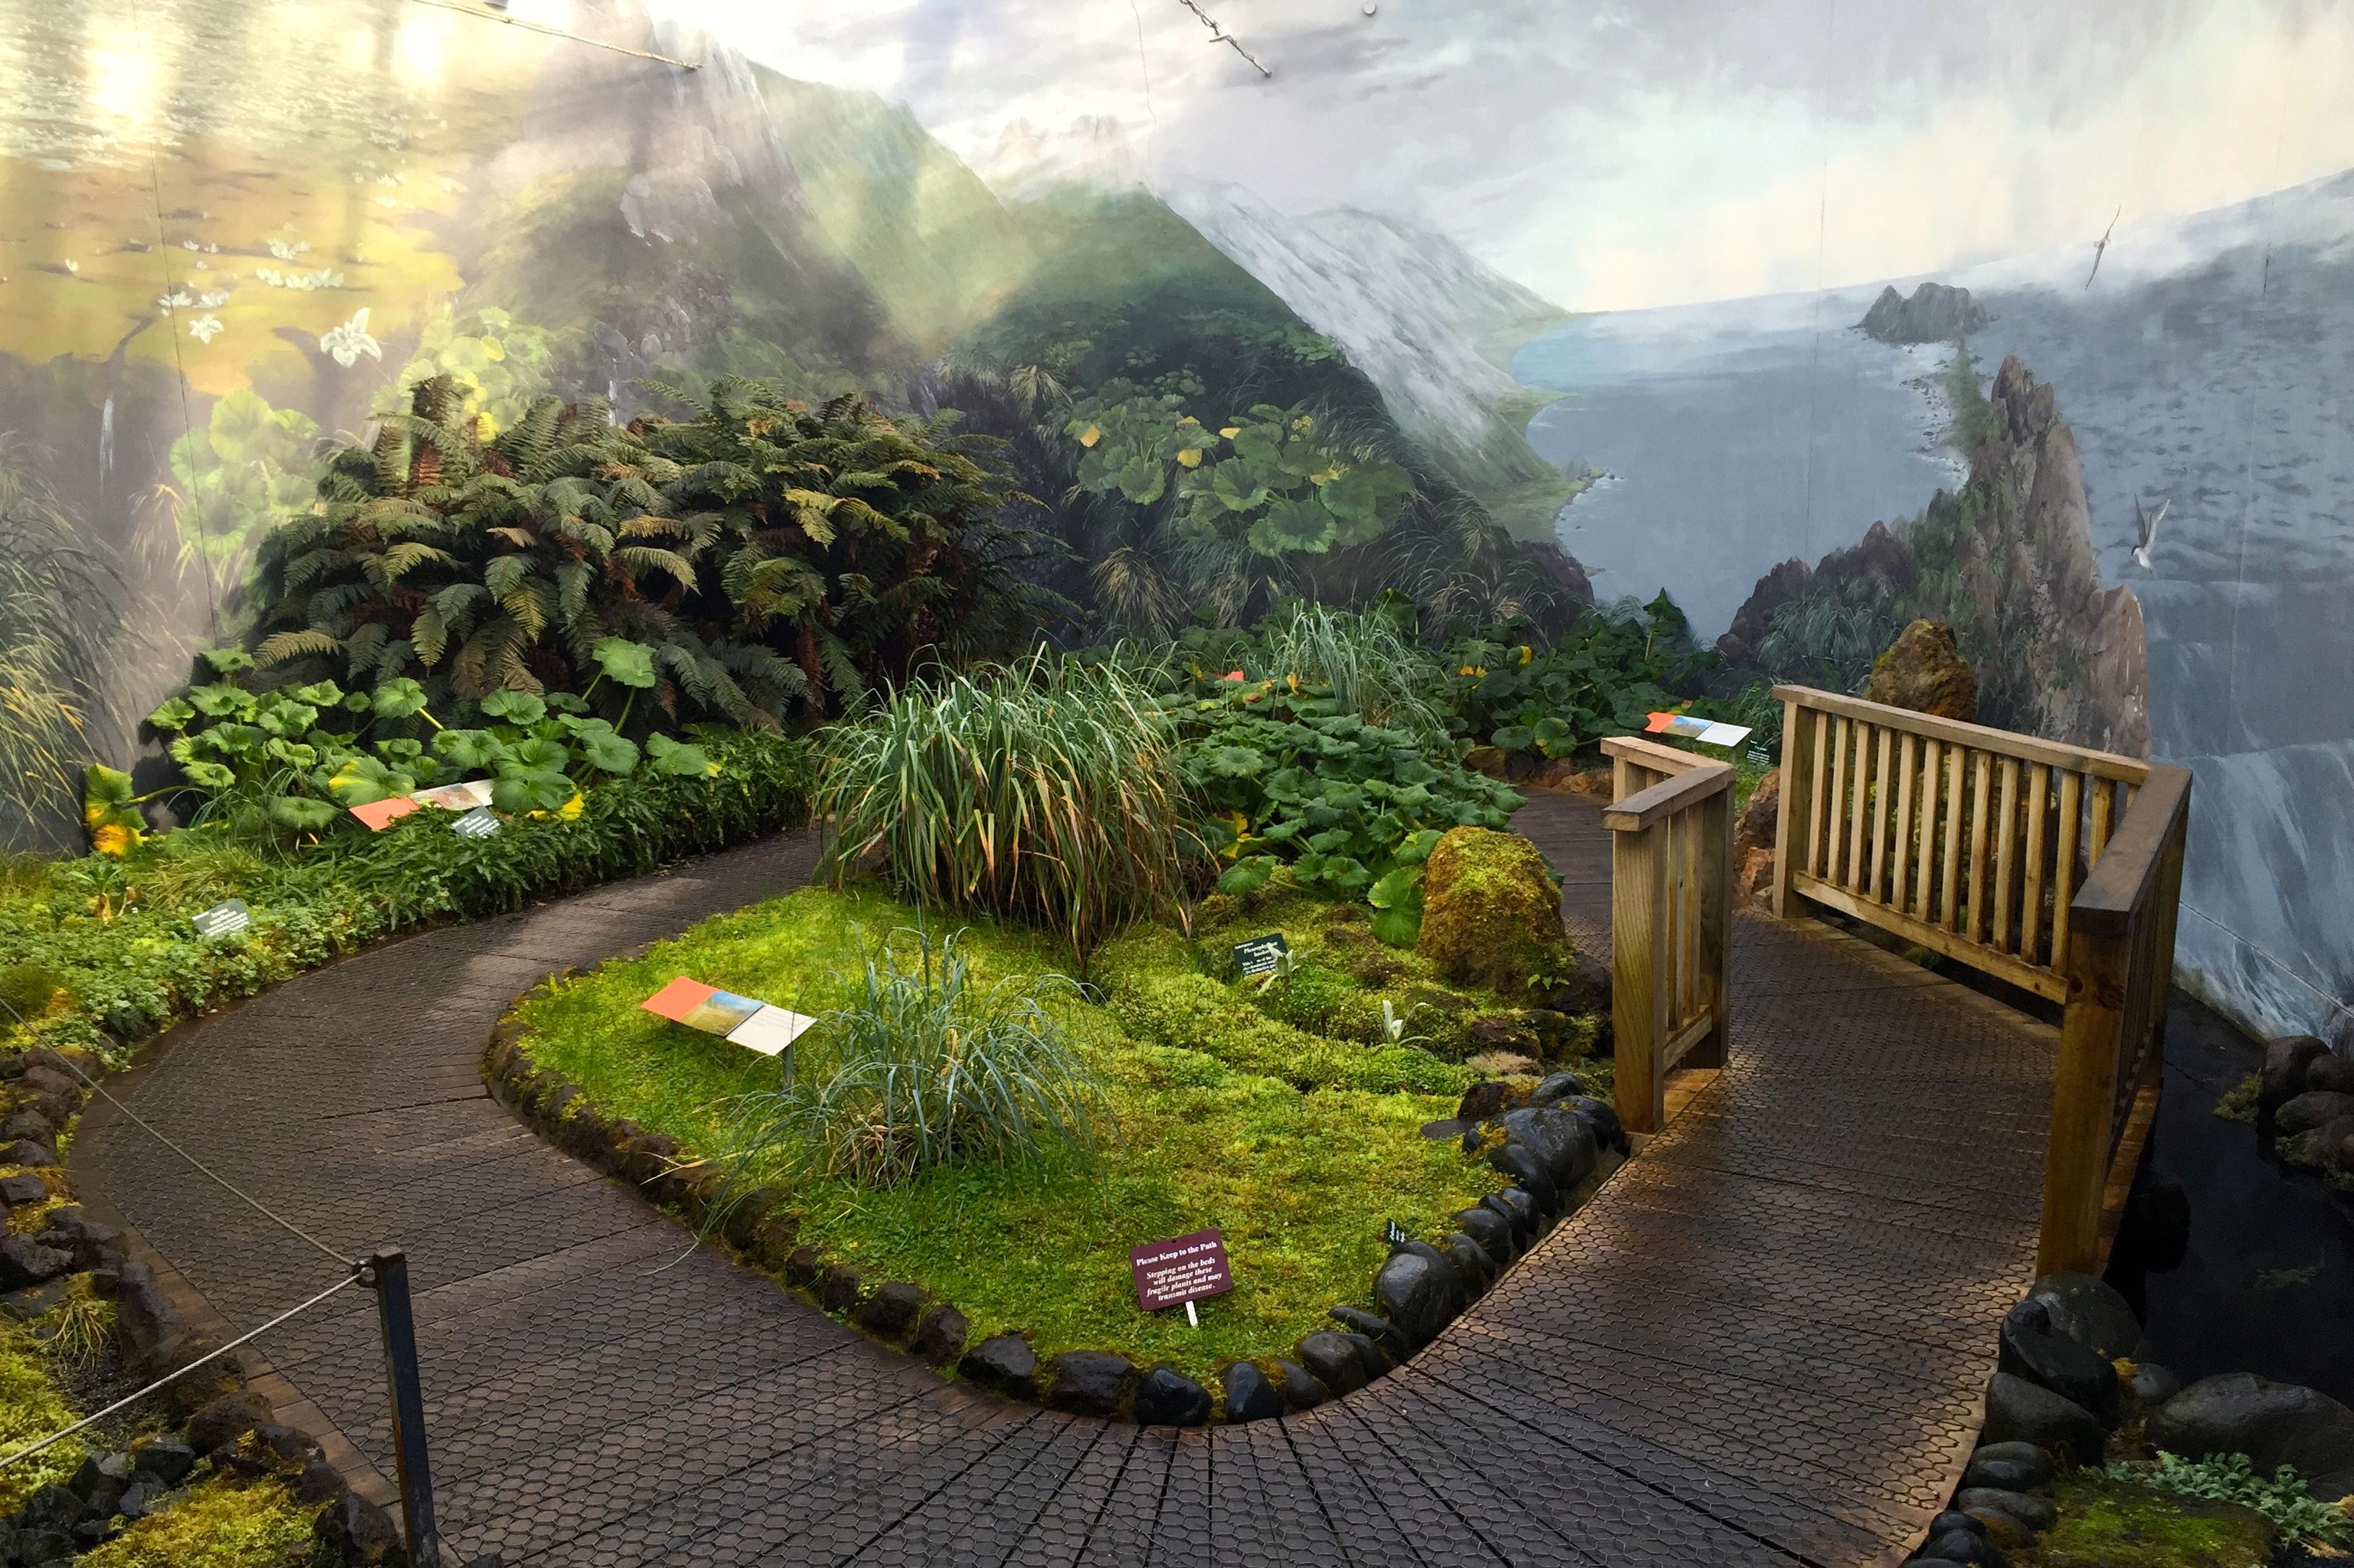 20_SUBANTARCTIC PLANT HOUSE INT